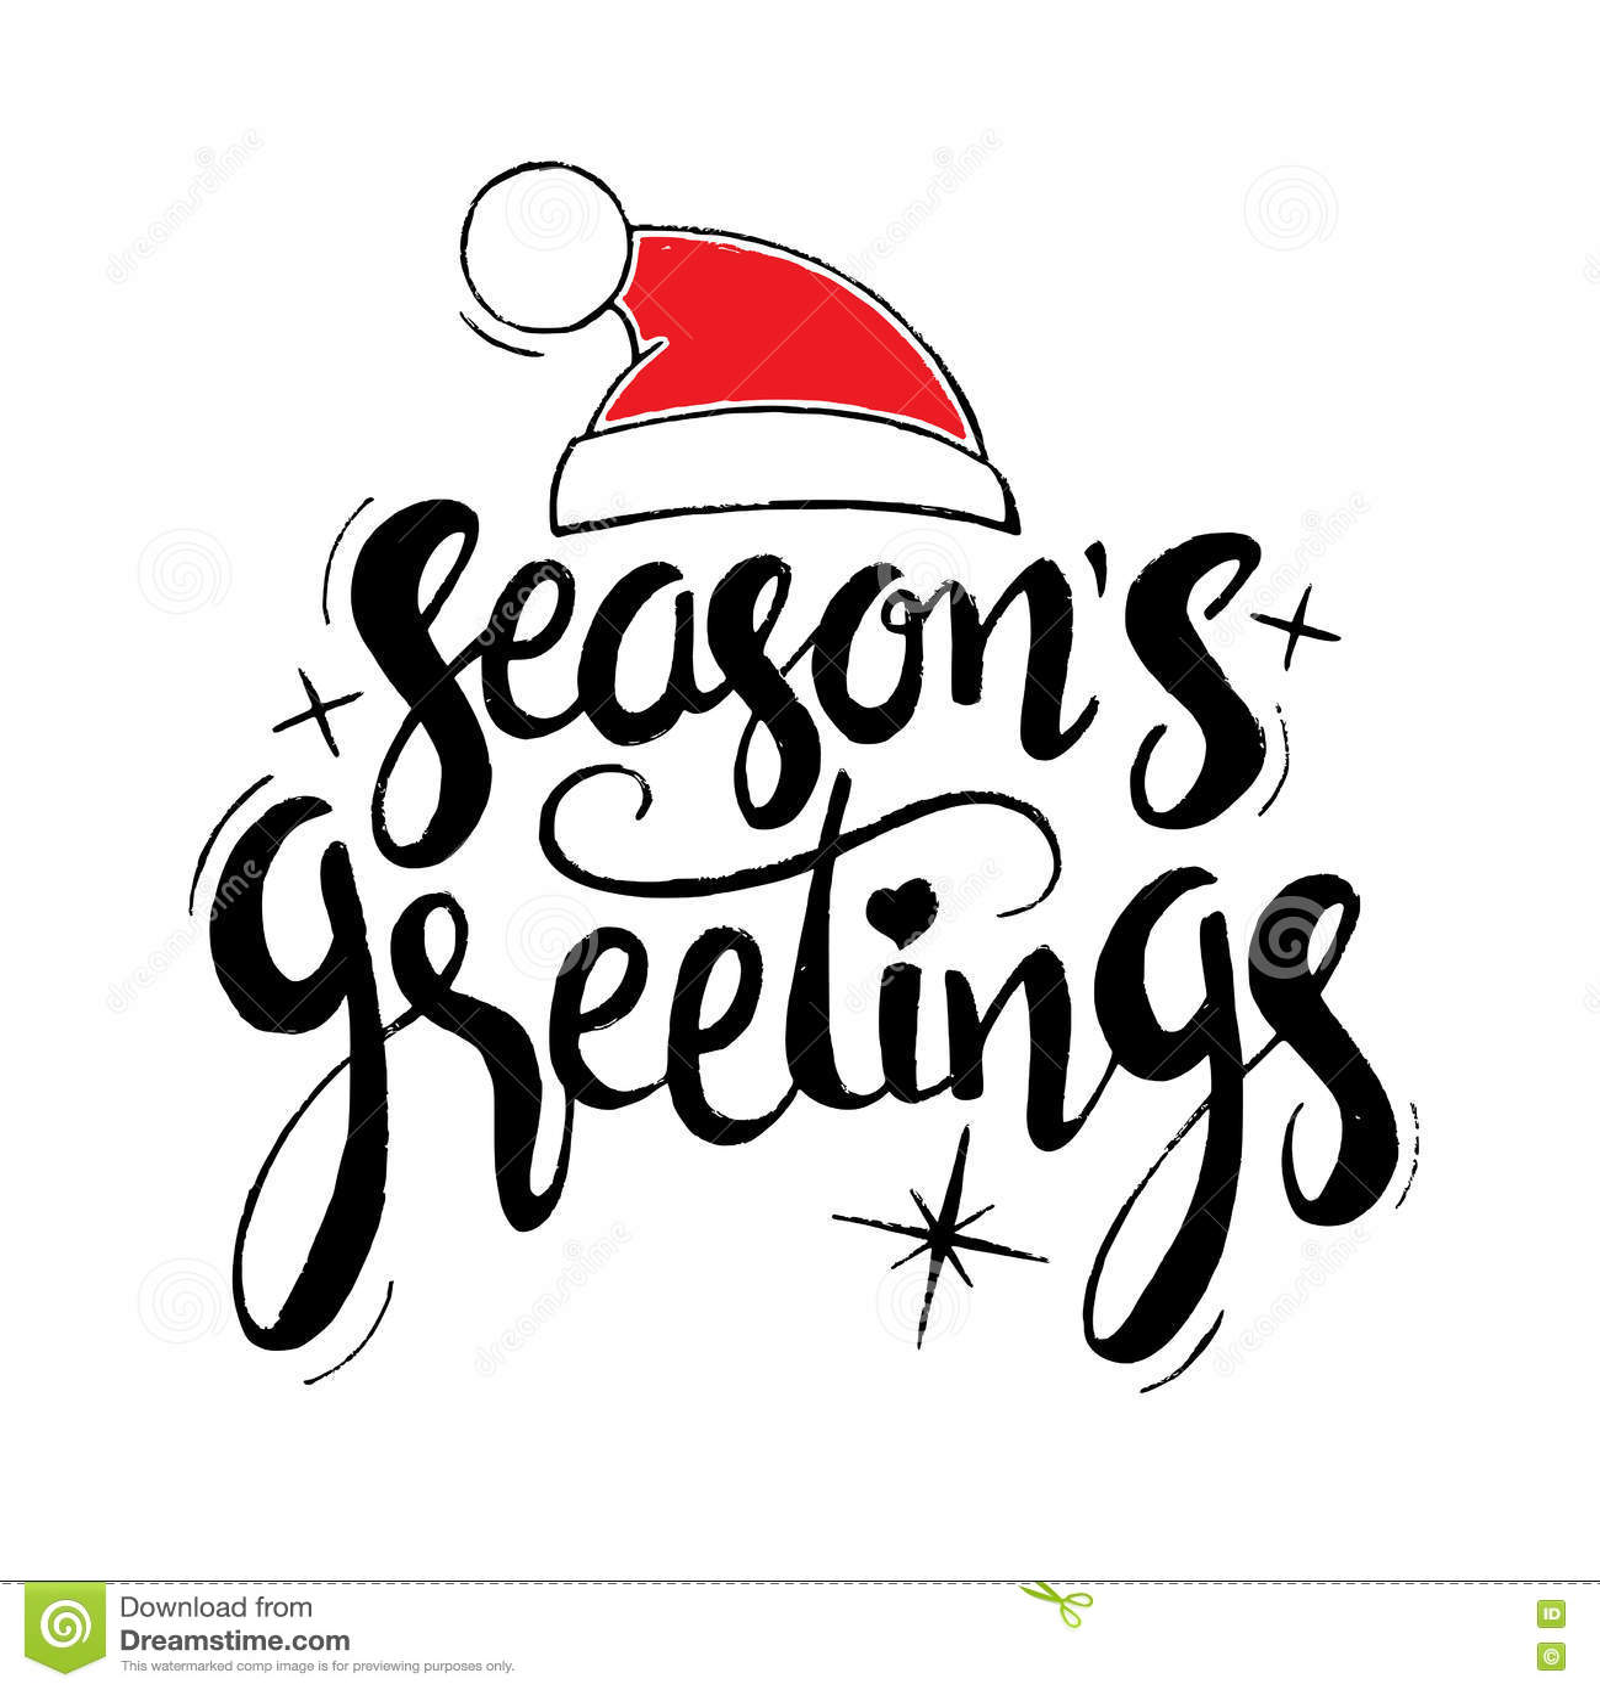 Seasons greetings hand drawn lettering stock vector illustration seasons greetings hand drawn lettering m4hsunfo